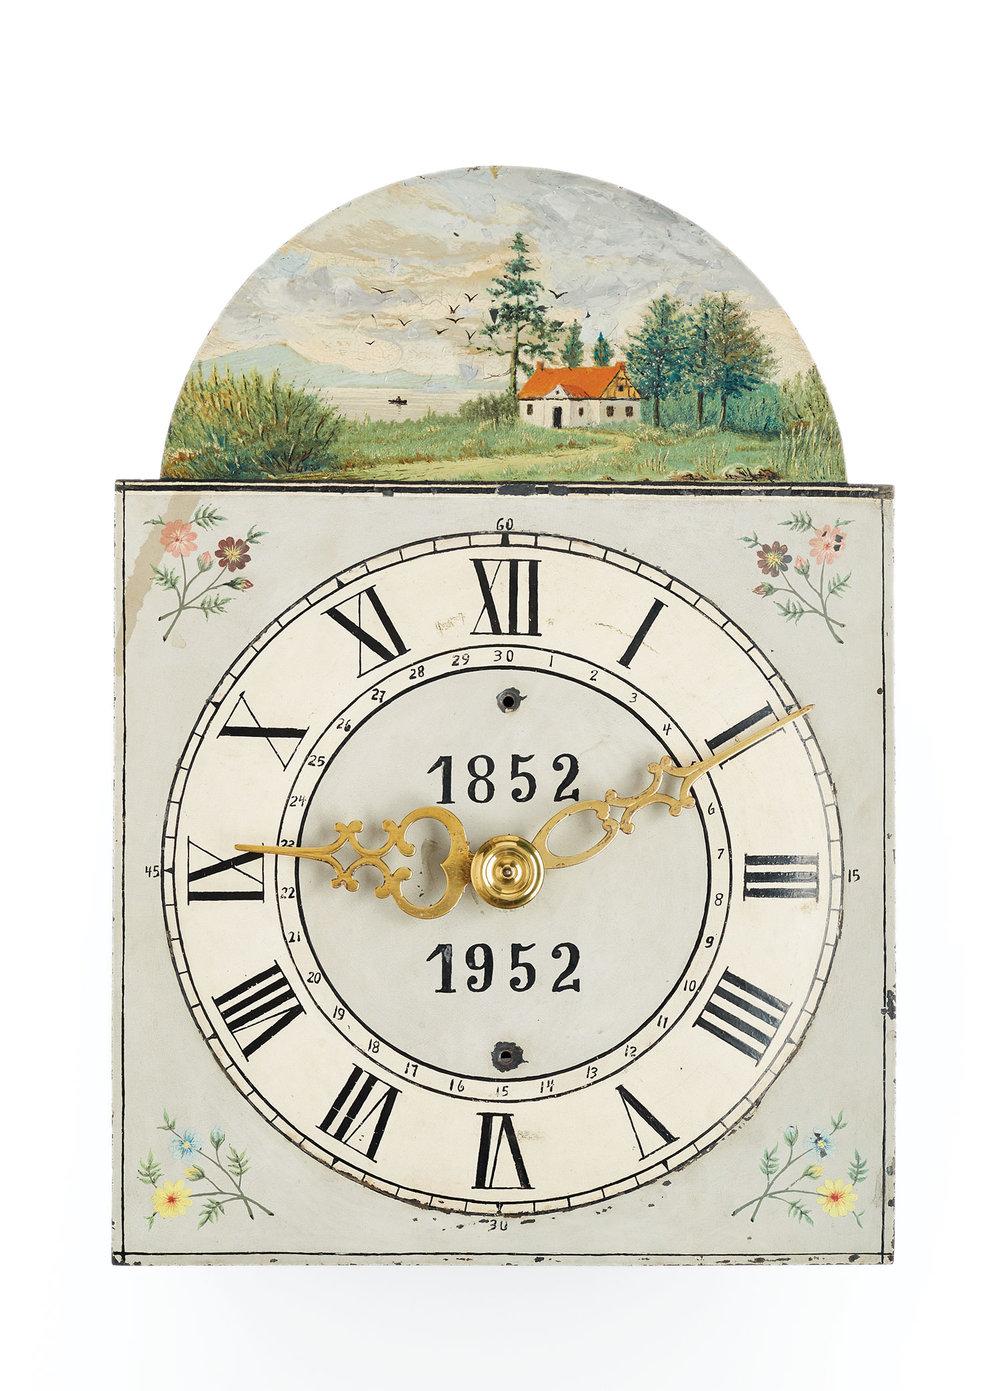 Hamm Clock, 1852. Manitoba Museum H9-6-867 (MC0258)